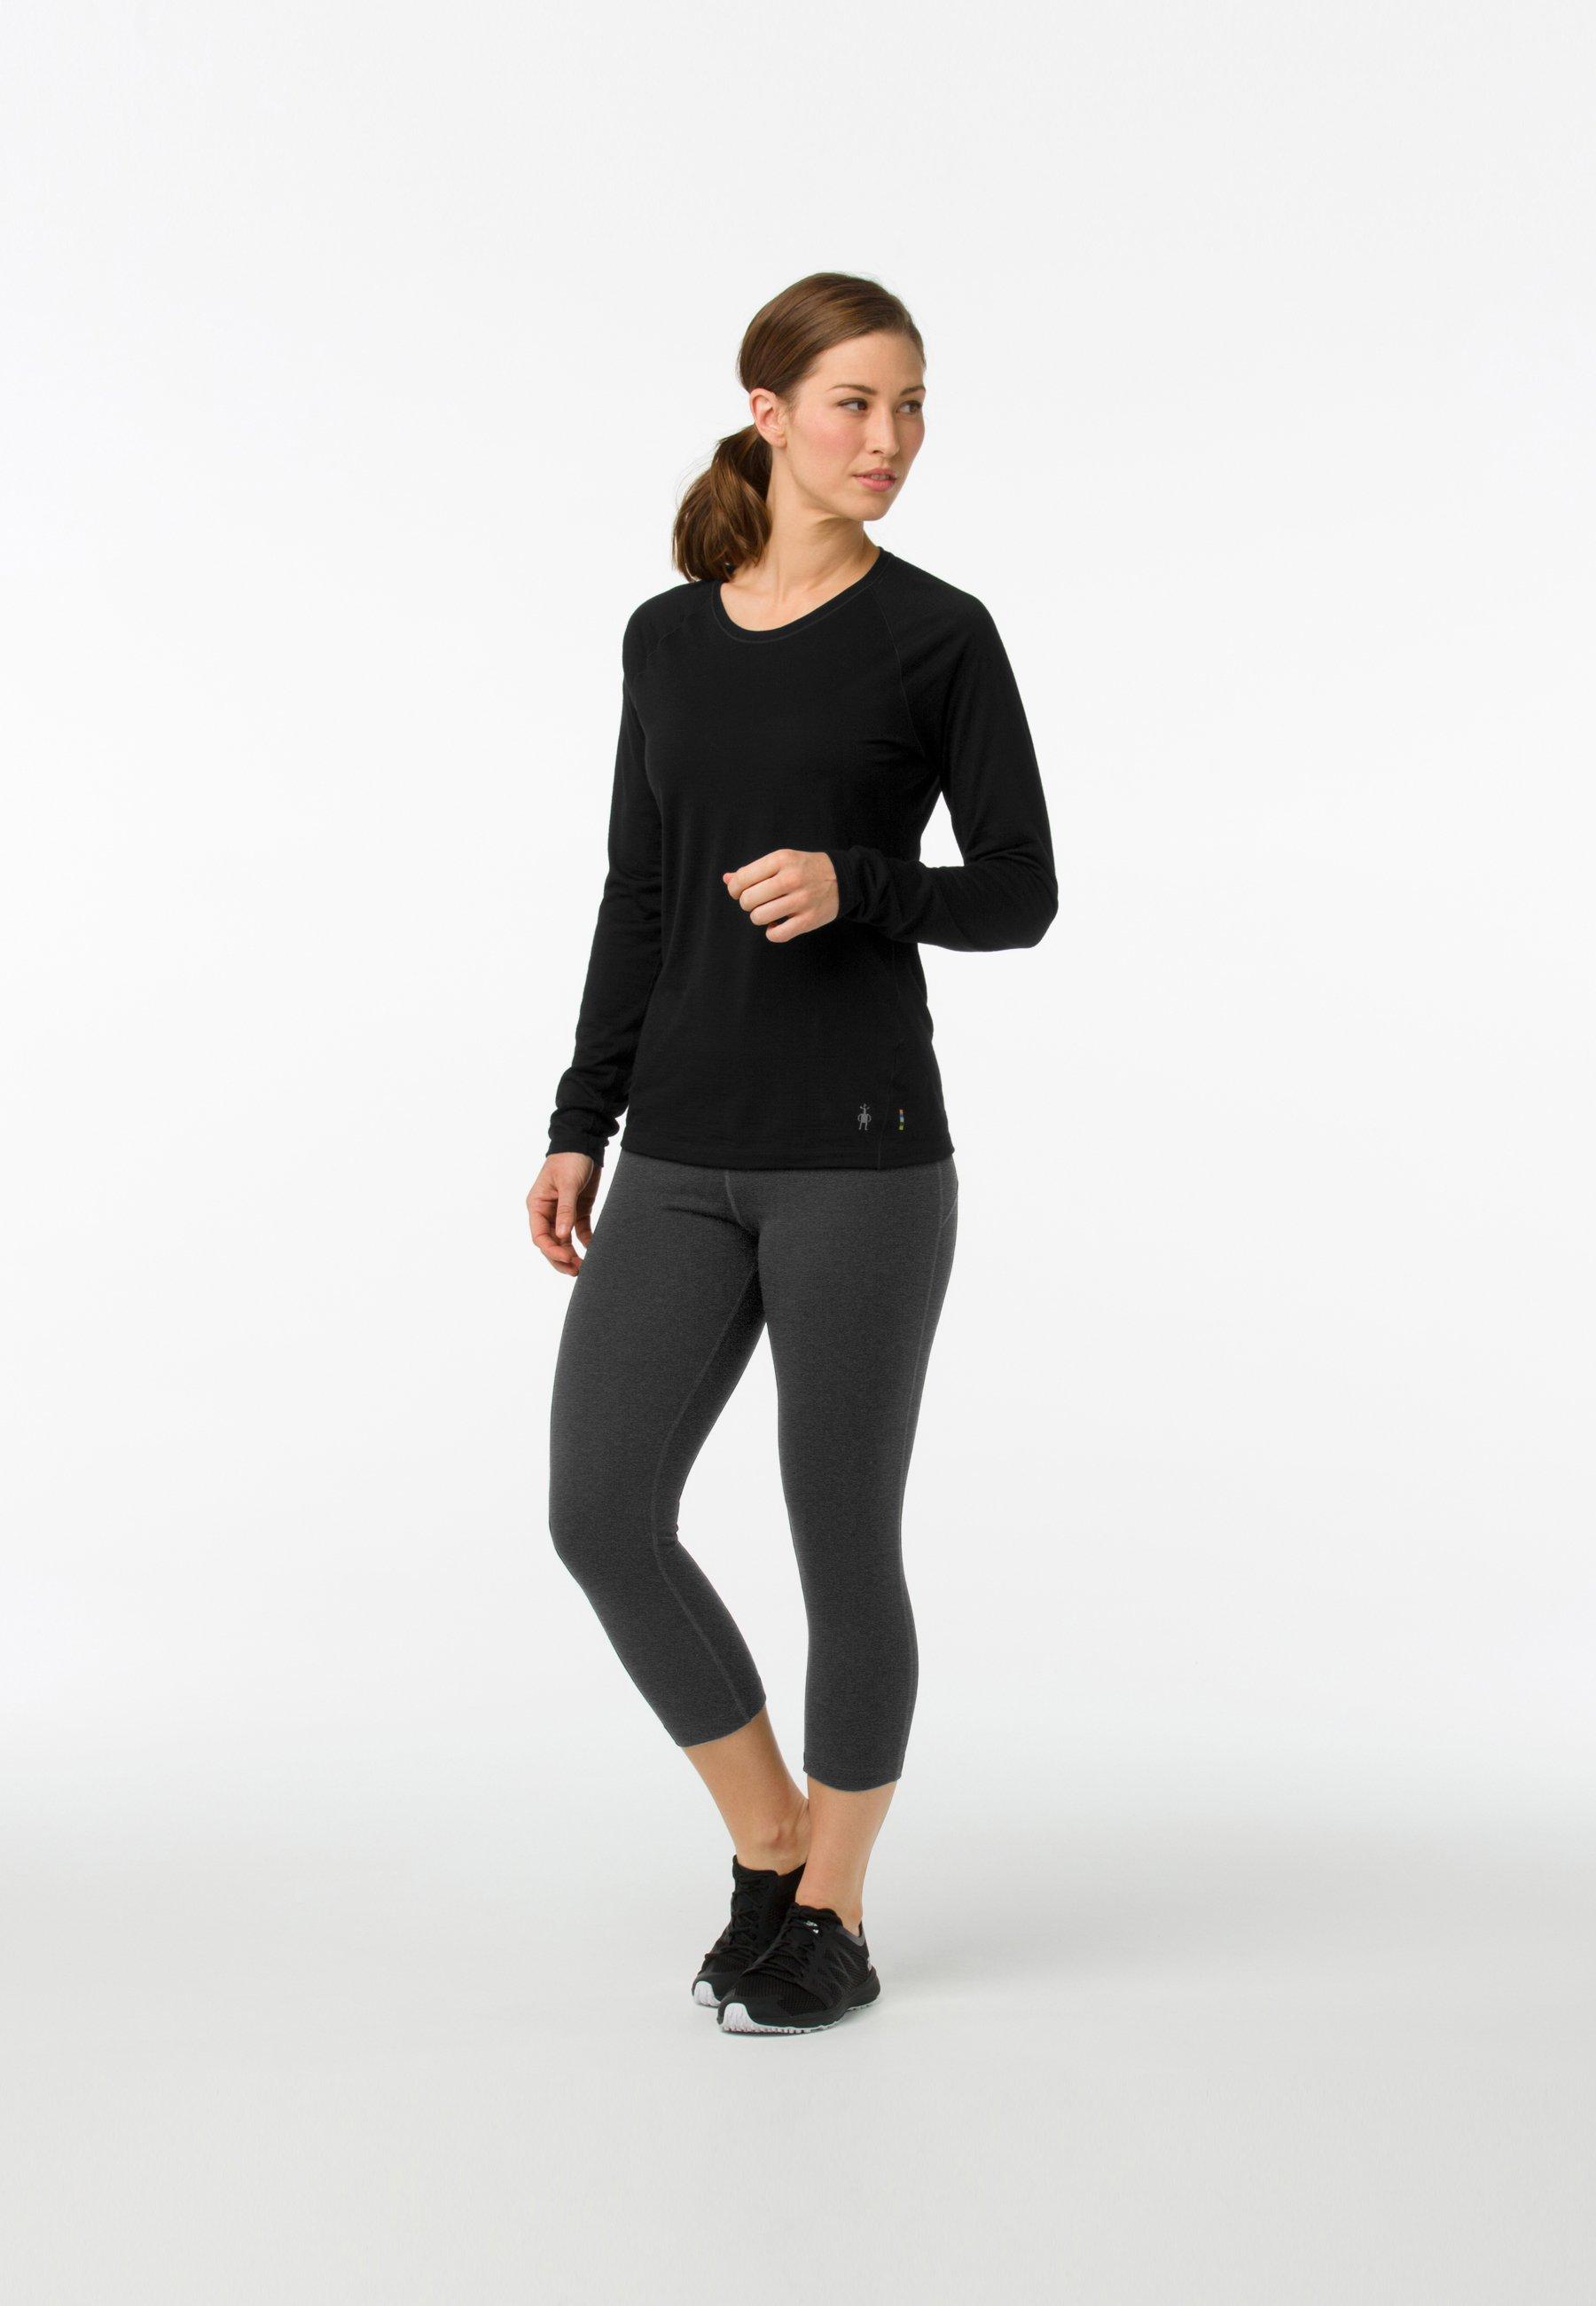 Femme LONG SLEEVE - T-shirt à manches longues